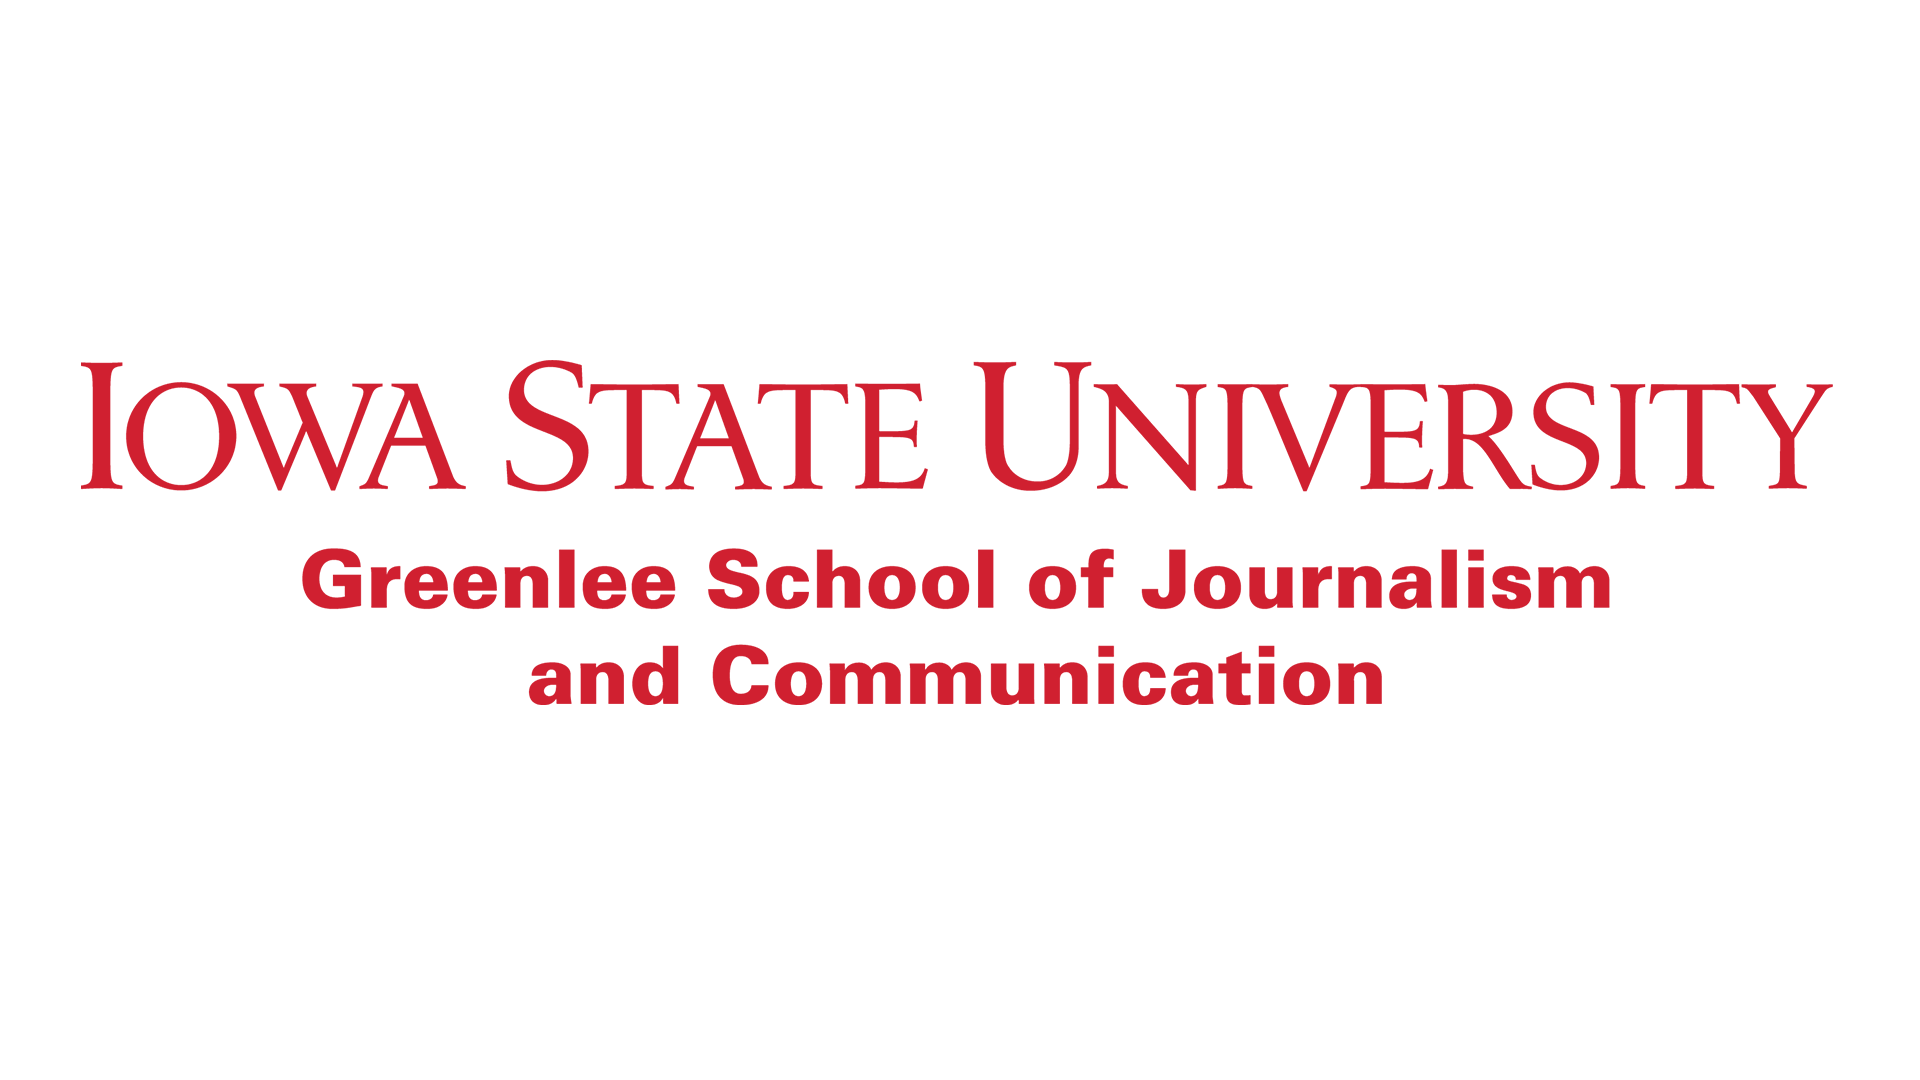 Iowa State University Greenlee School wordmark